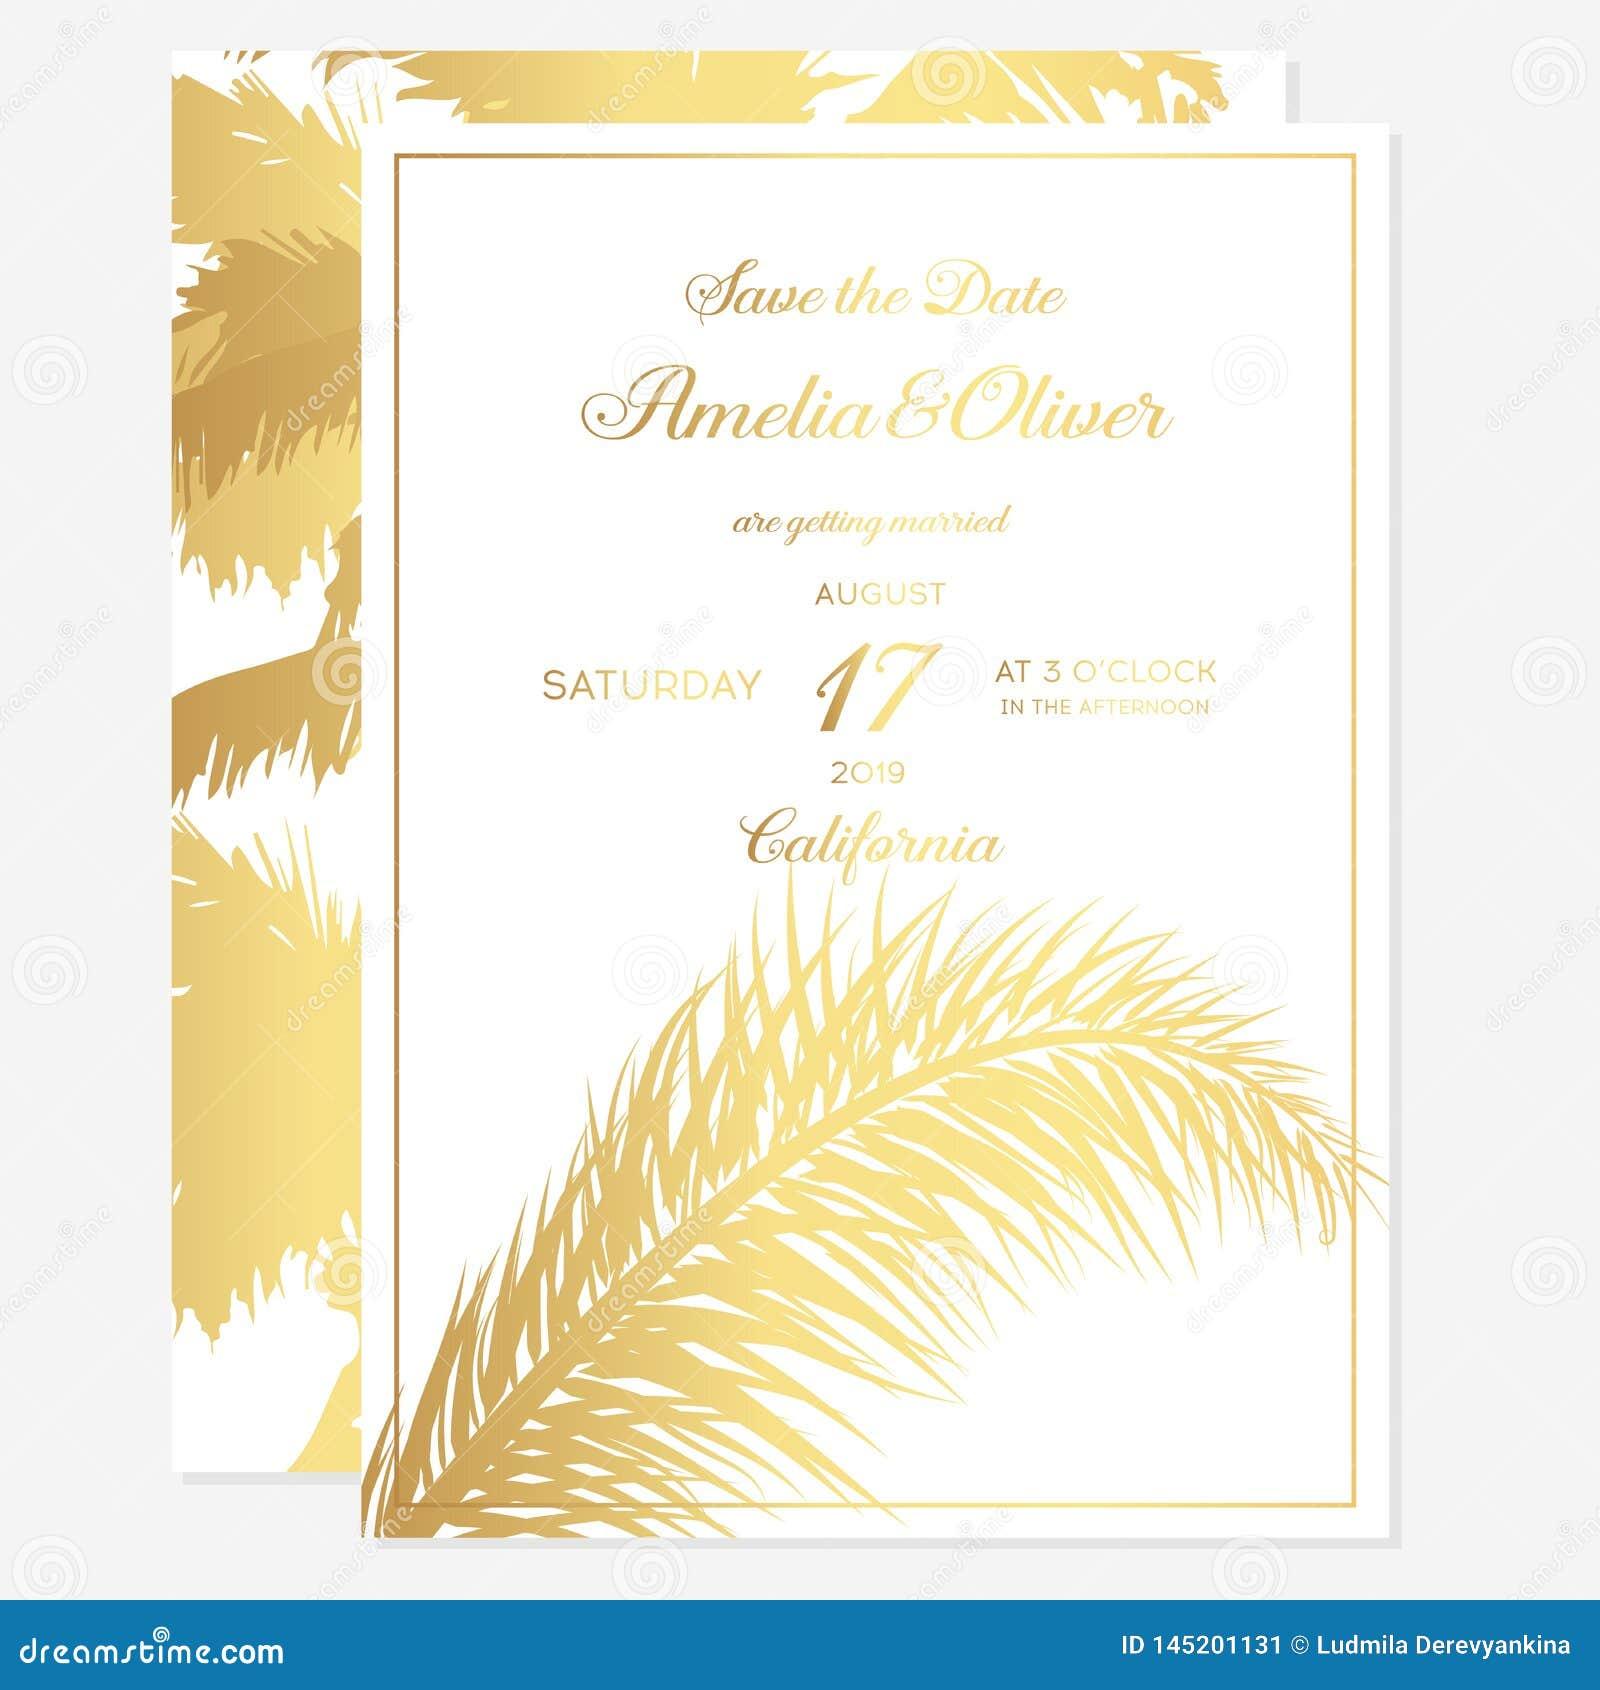 Minimalist Botanical Wedding Invitation Card Template Design Vector Decorative Greeting Card Or Invitation Design Background Stock Illustration Illustration Of Foliage Design 145201131